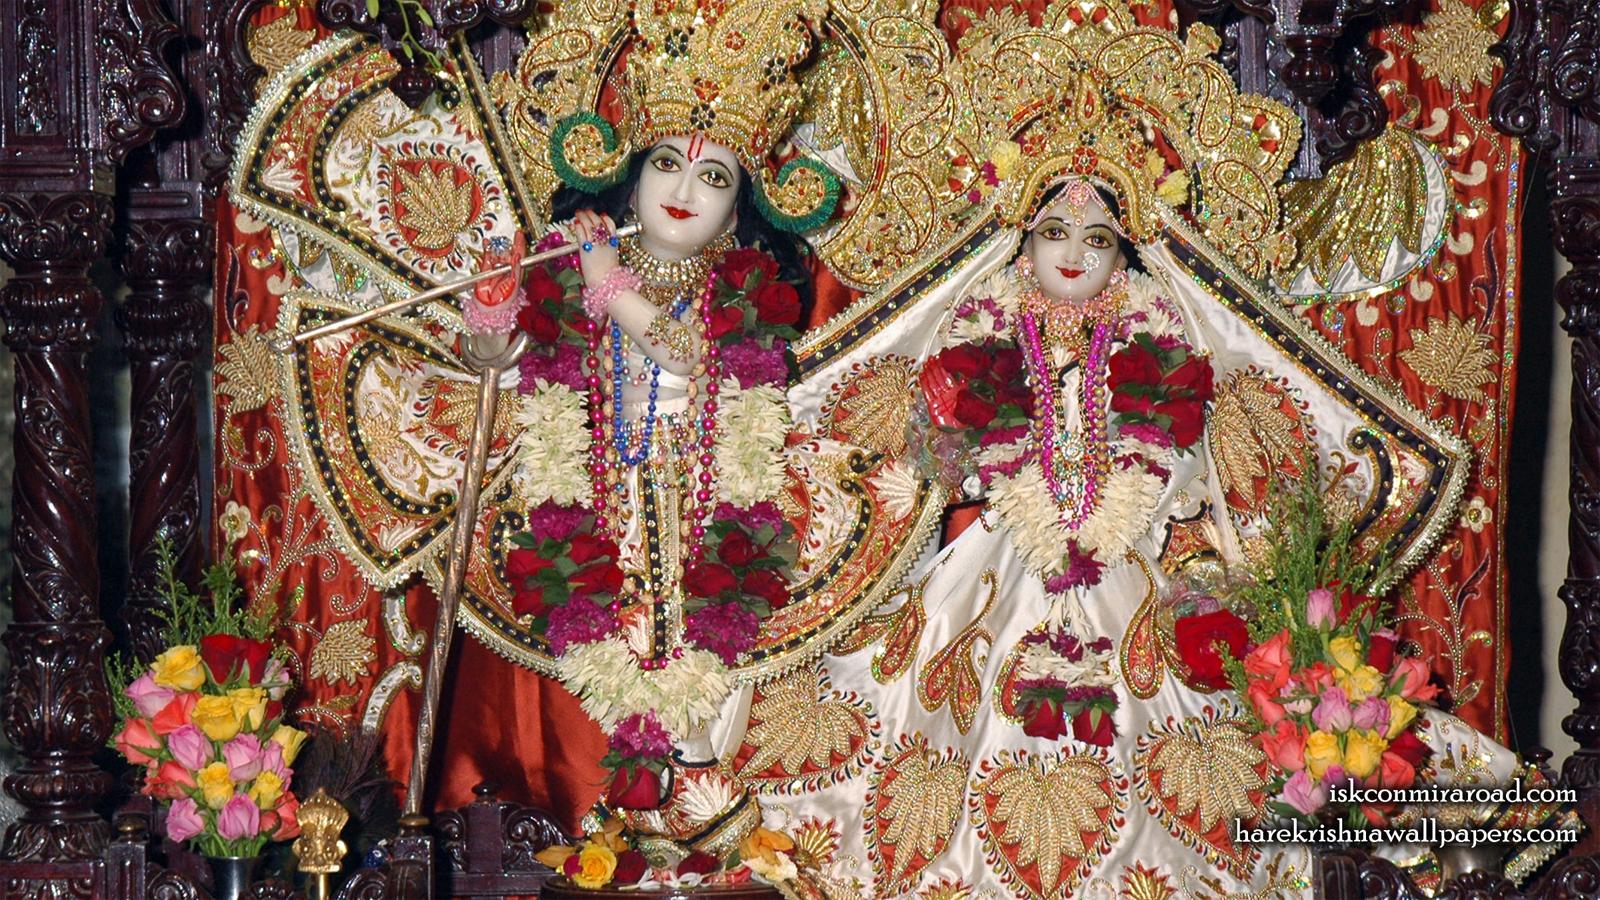 Sri Sri Radha Giridhari Wallpaper (015) Size 1600x900 Download